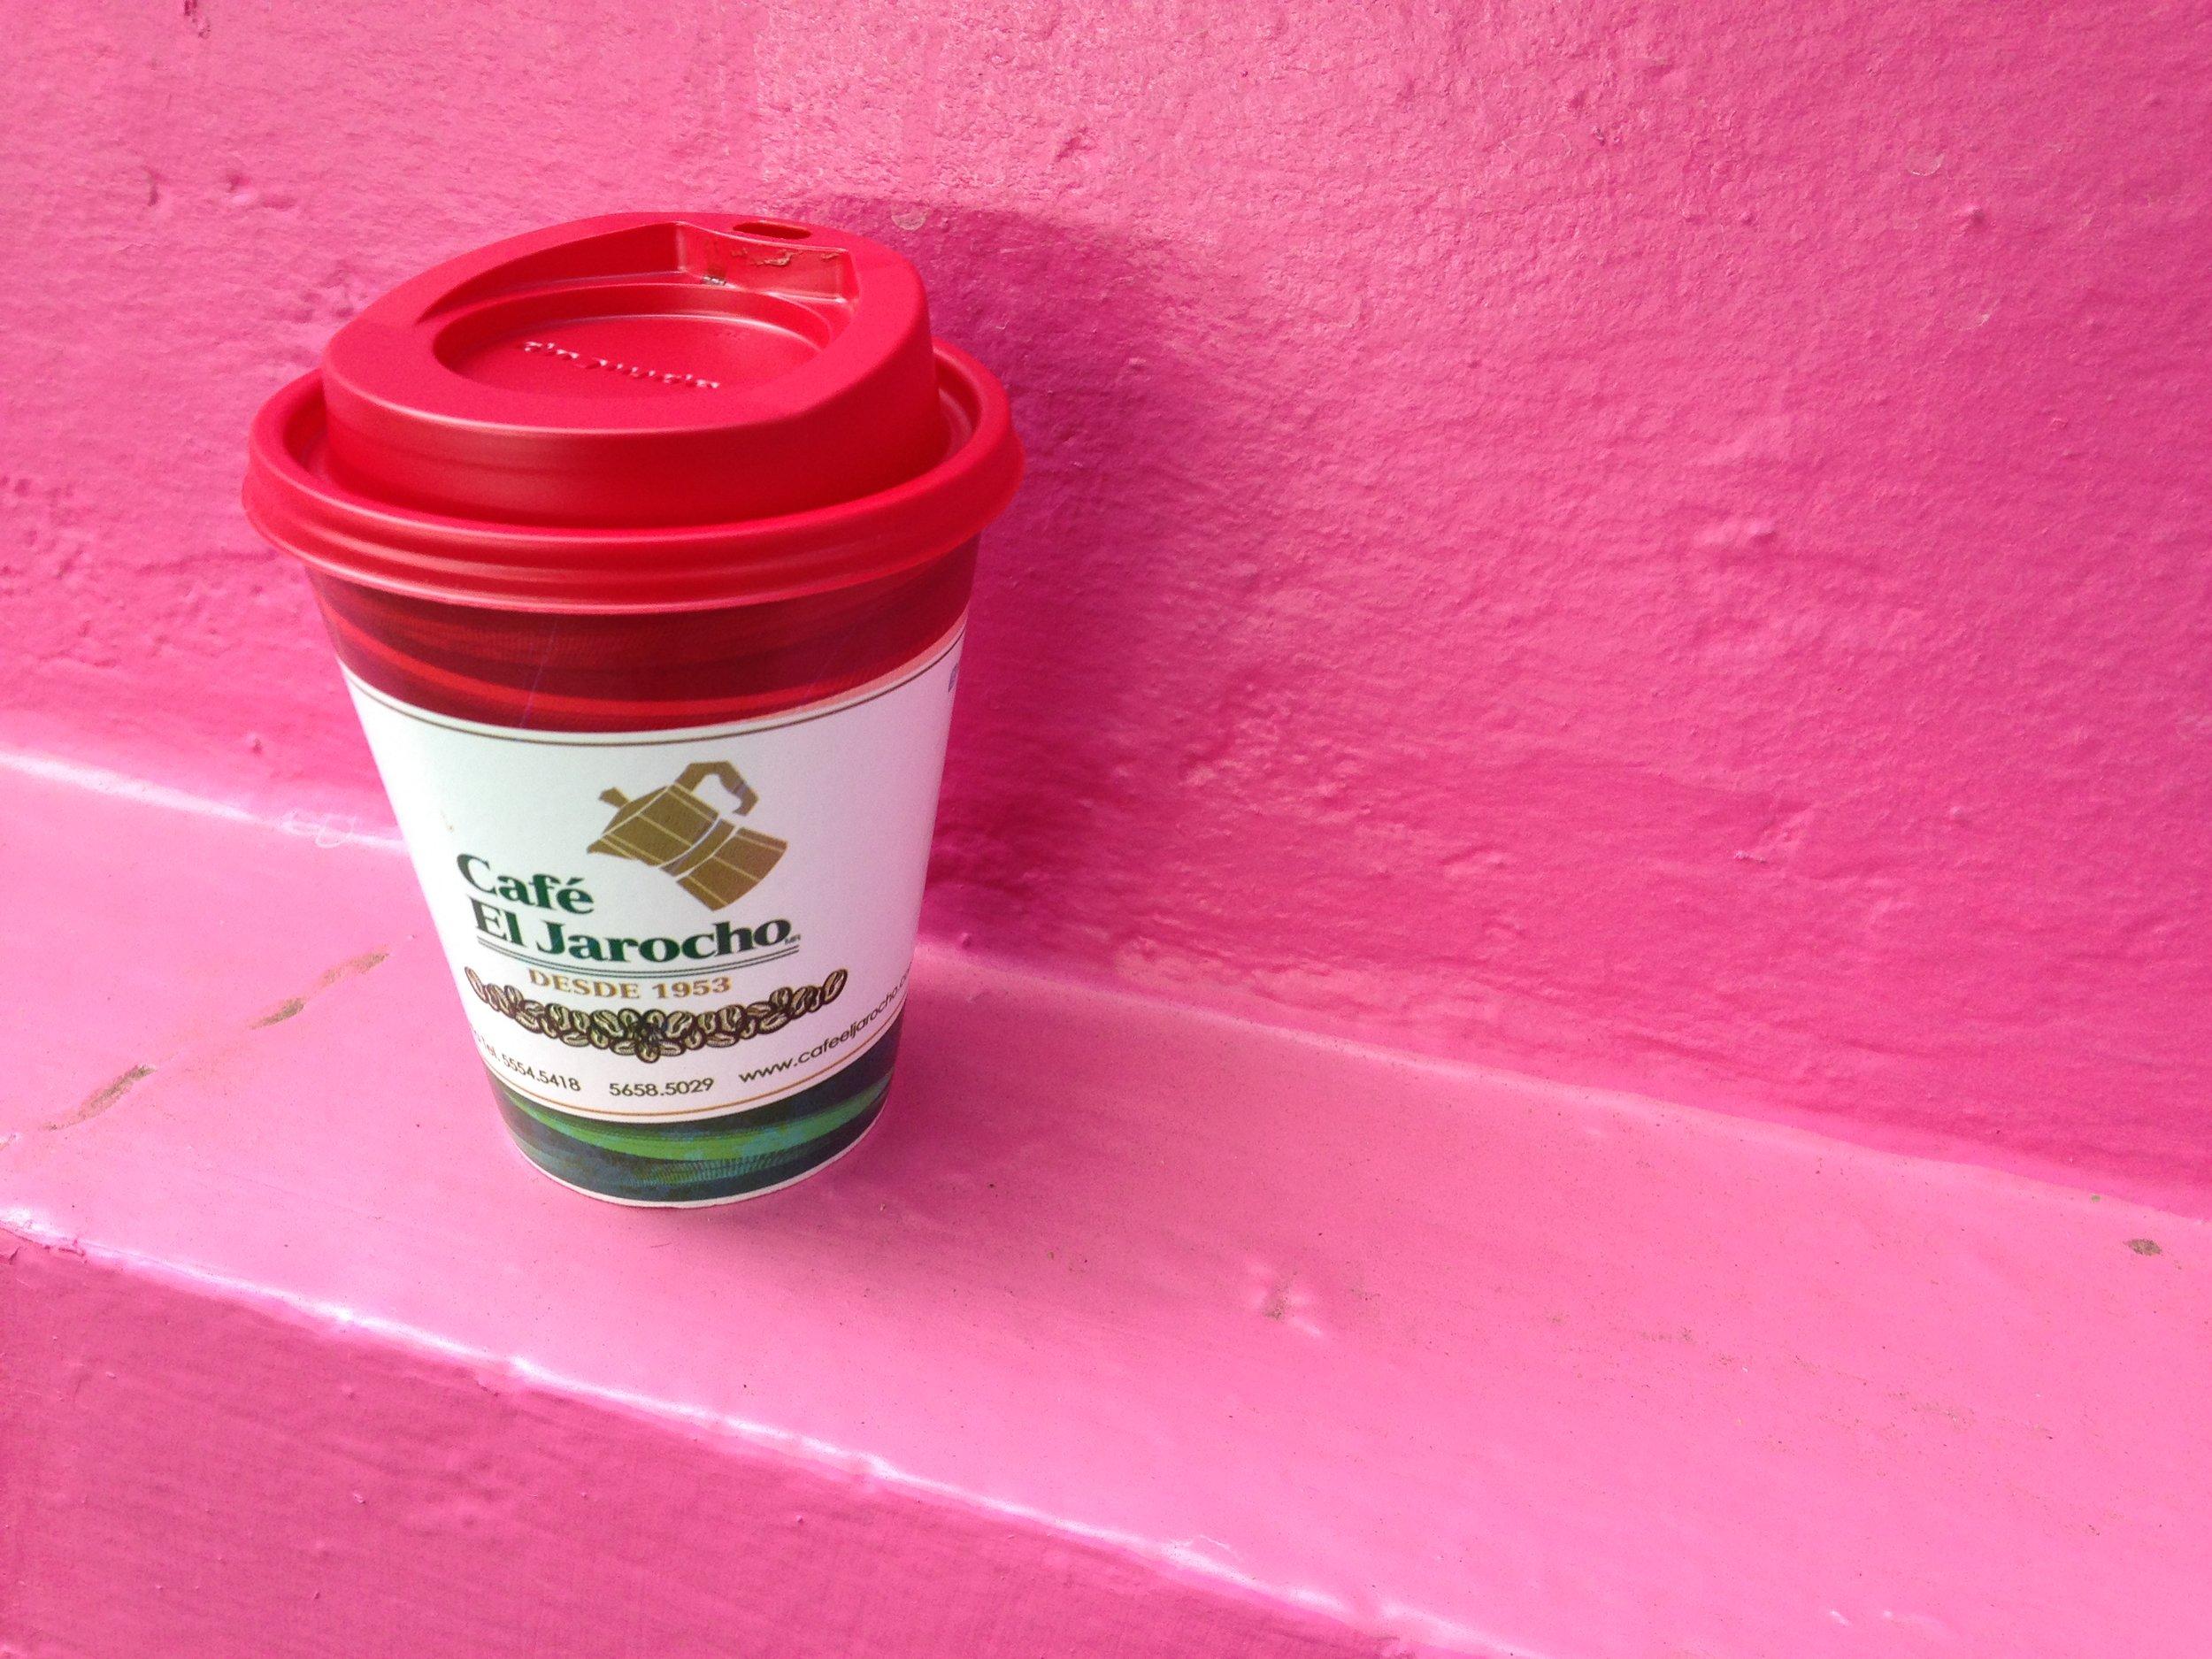 Cafe El Jarocho's former coffee cup. Lauren Cocking..JPG